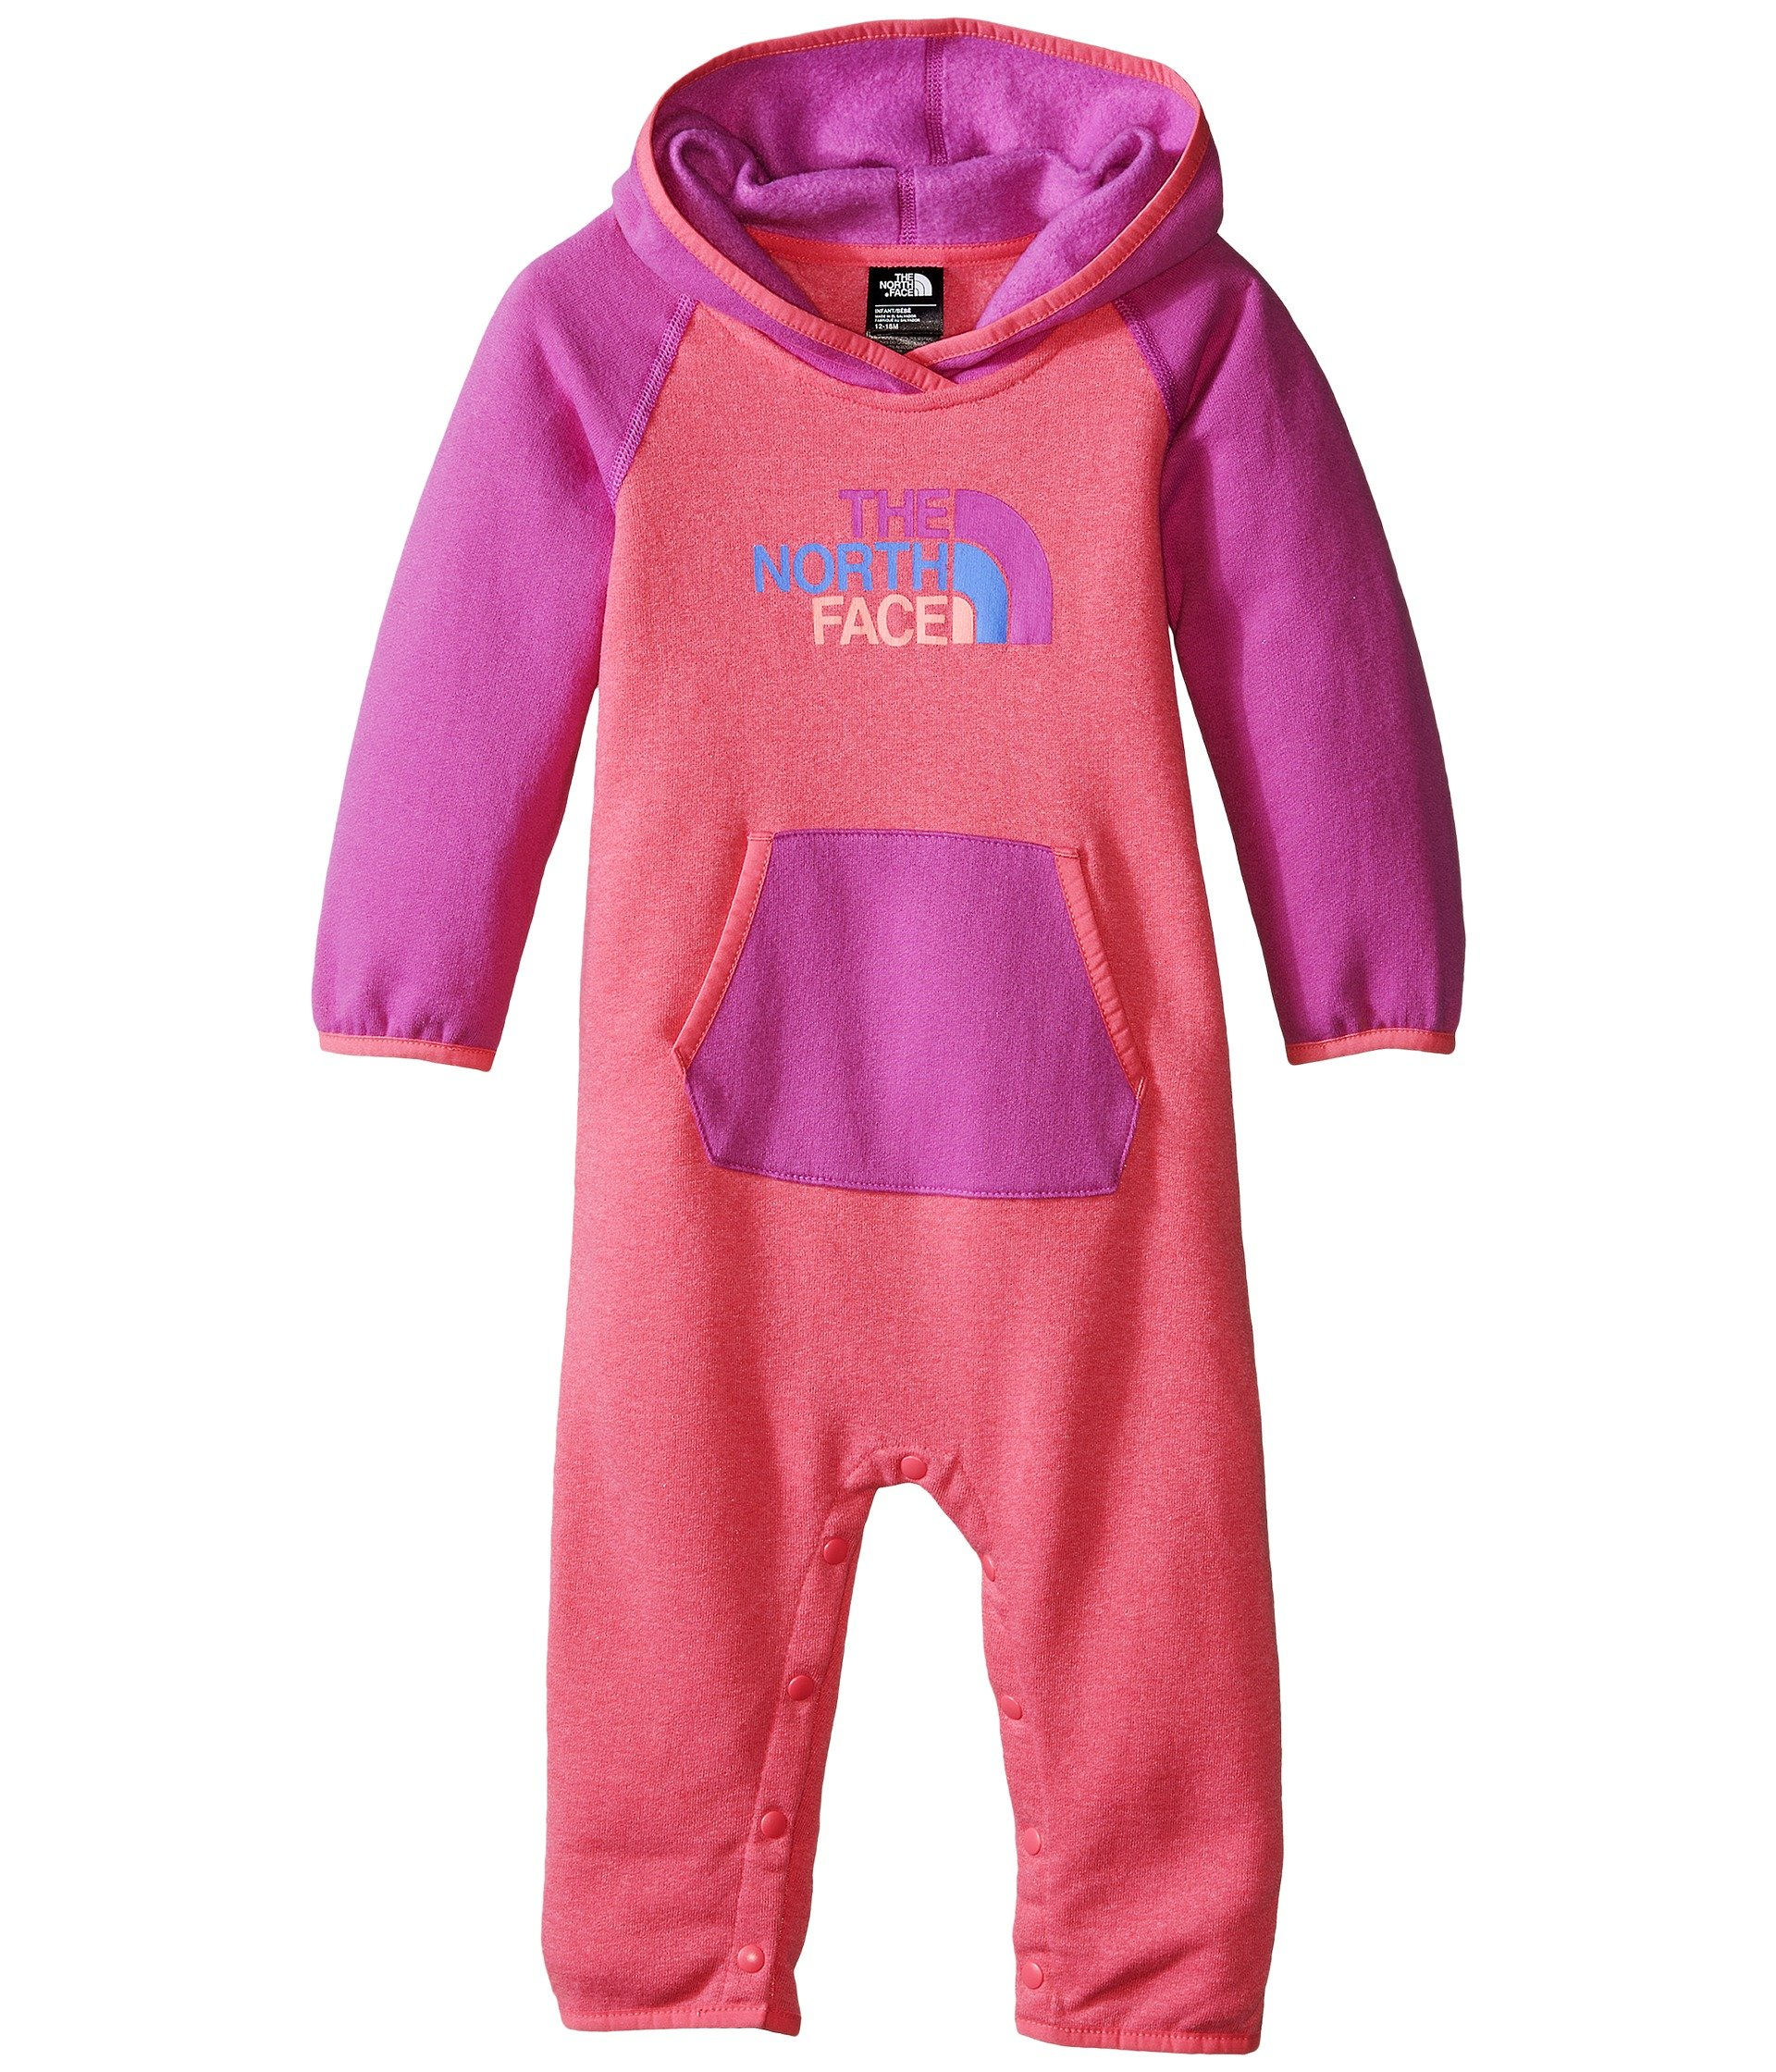 Enterizo para Bebe The North Face Kids Logowear One-Piece (Infant)  + The North Face en VeoyCompro.net